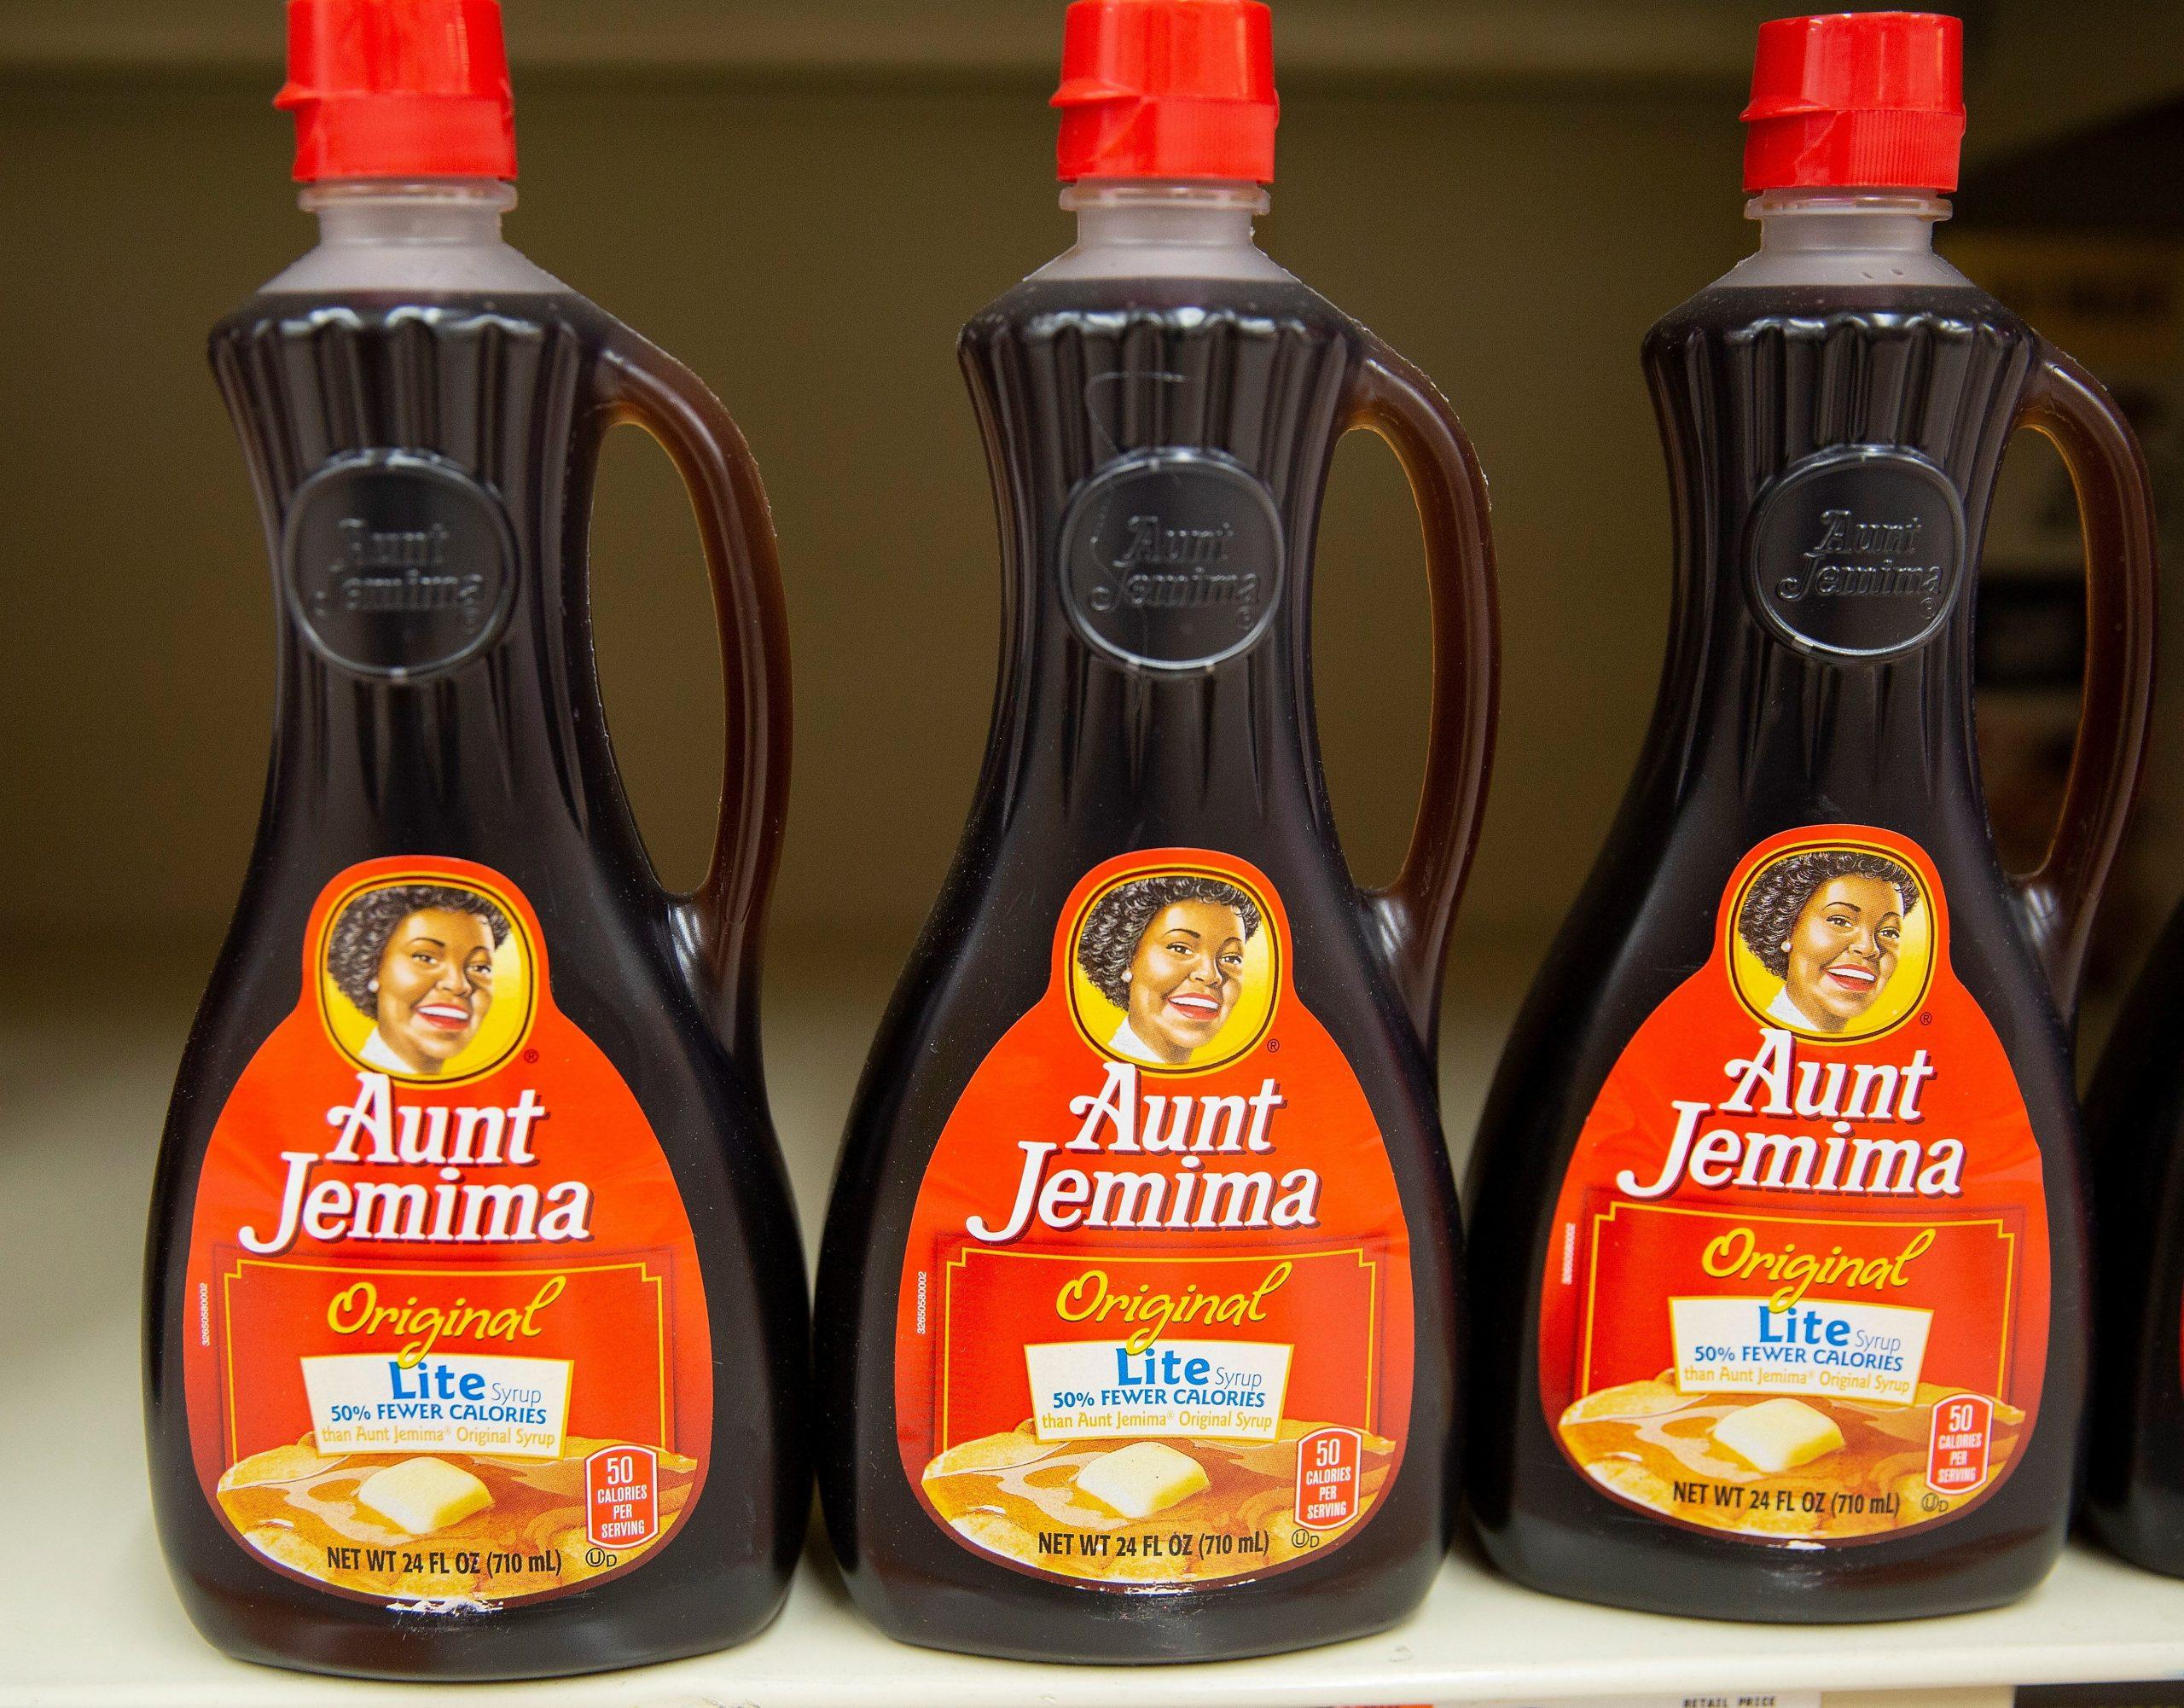 Botellas de la marca Aunt Jemima en un supermercado en Lynn, Massachusetts (EE.UU.)